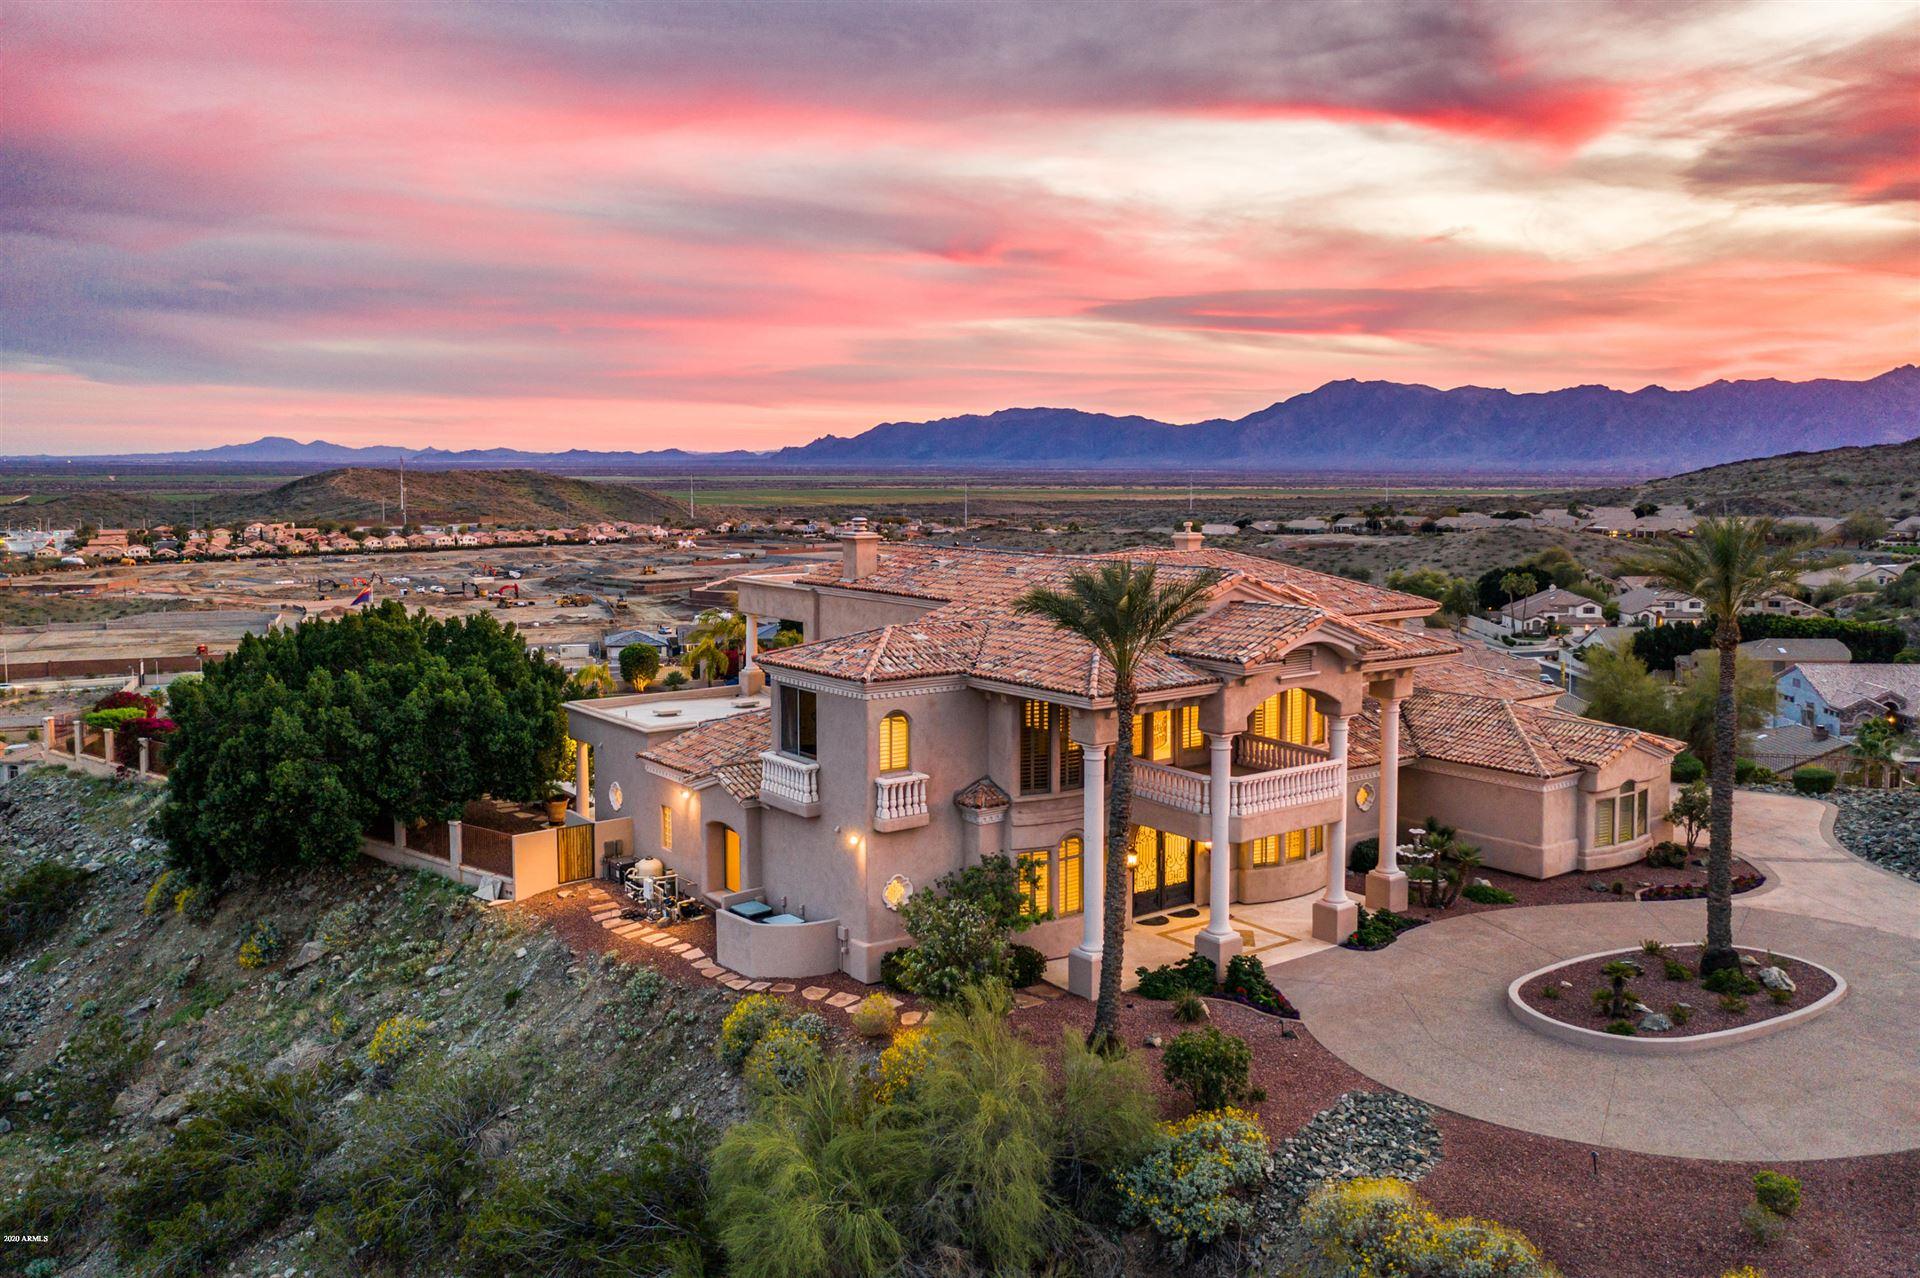 15802 S 7TH Street, Phoenix, AZ 85048 - MLS#: 6060312